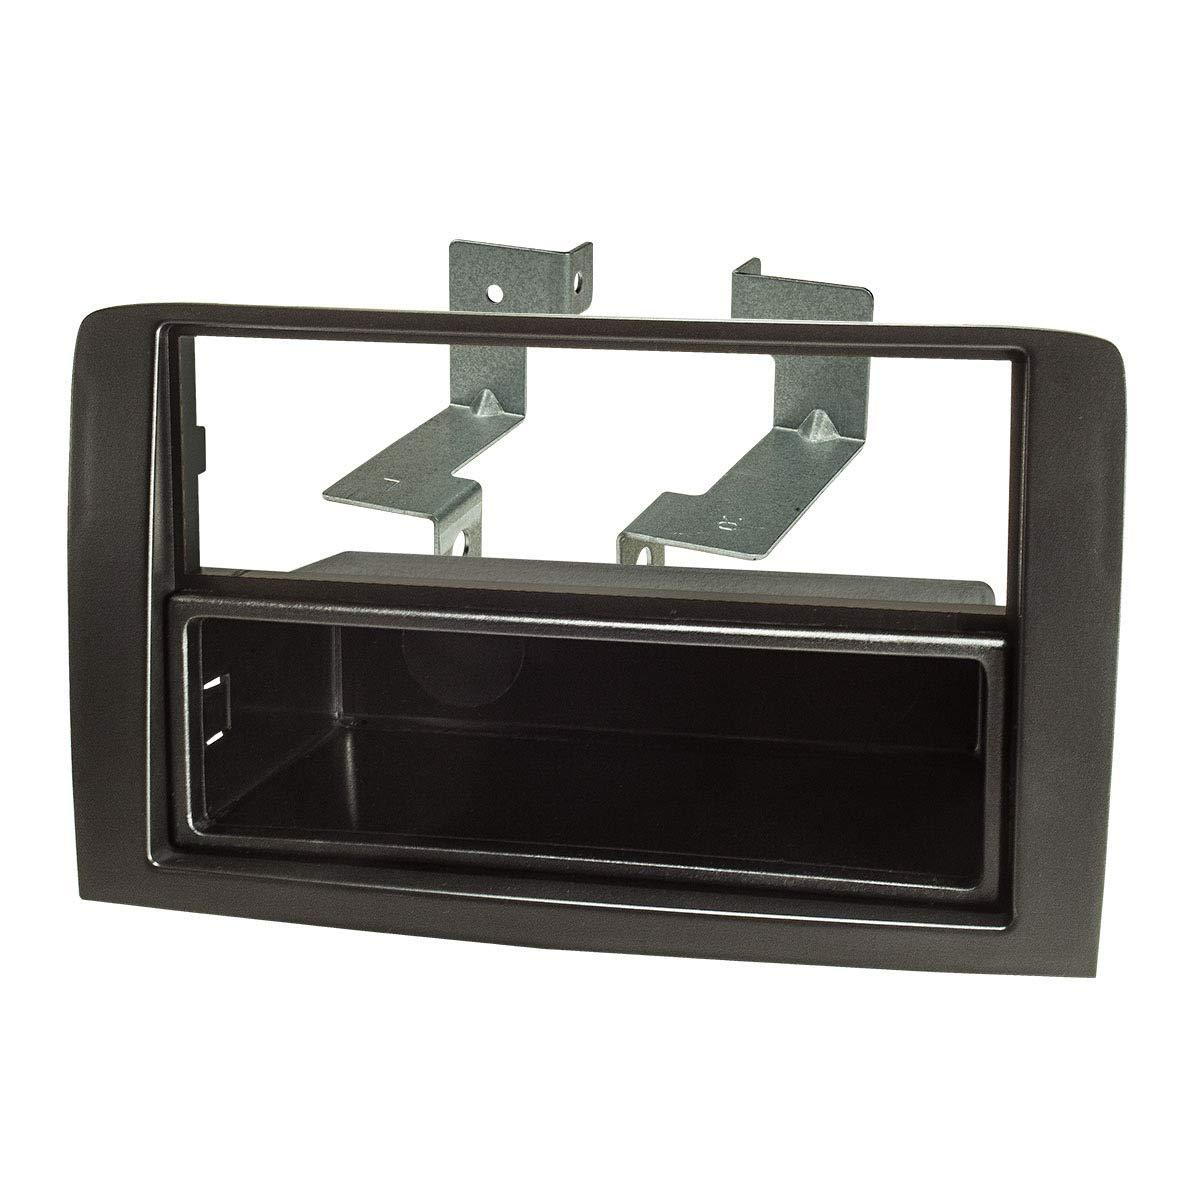 noir ACV electronic fa/çade dautoradio pour fiat idea set